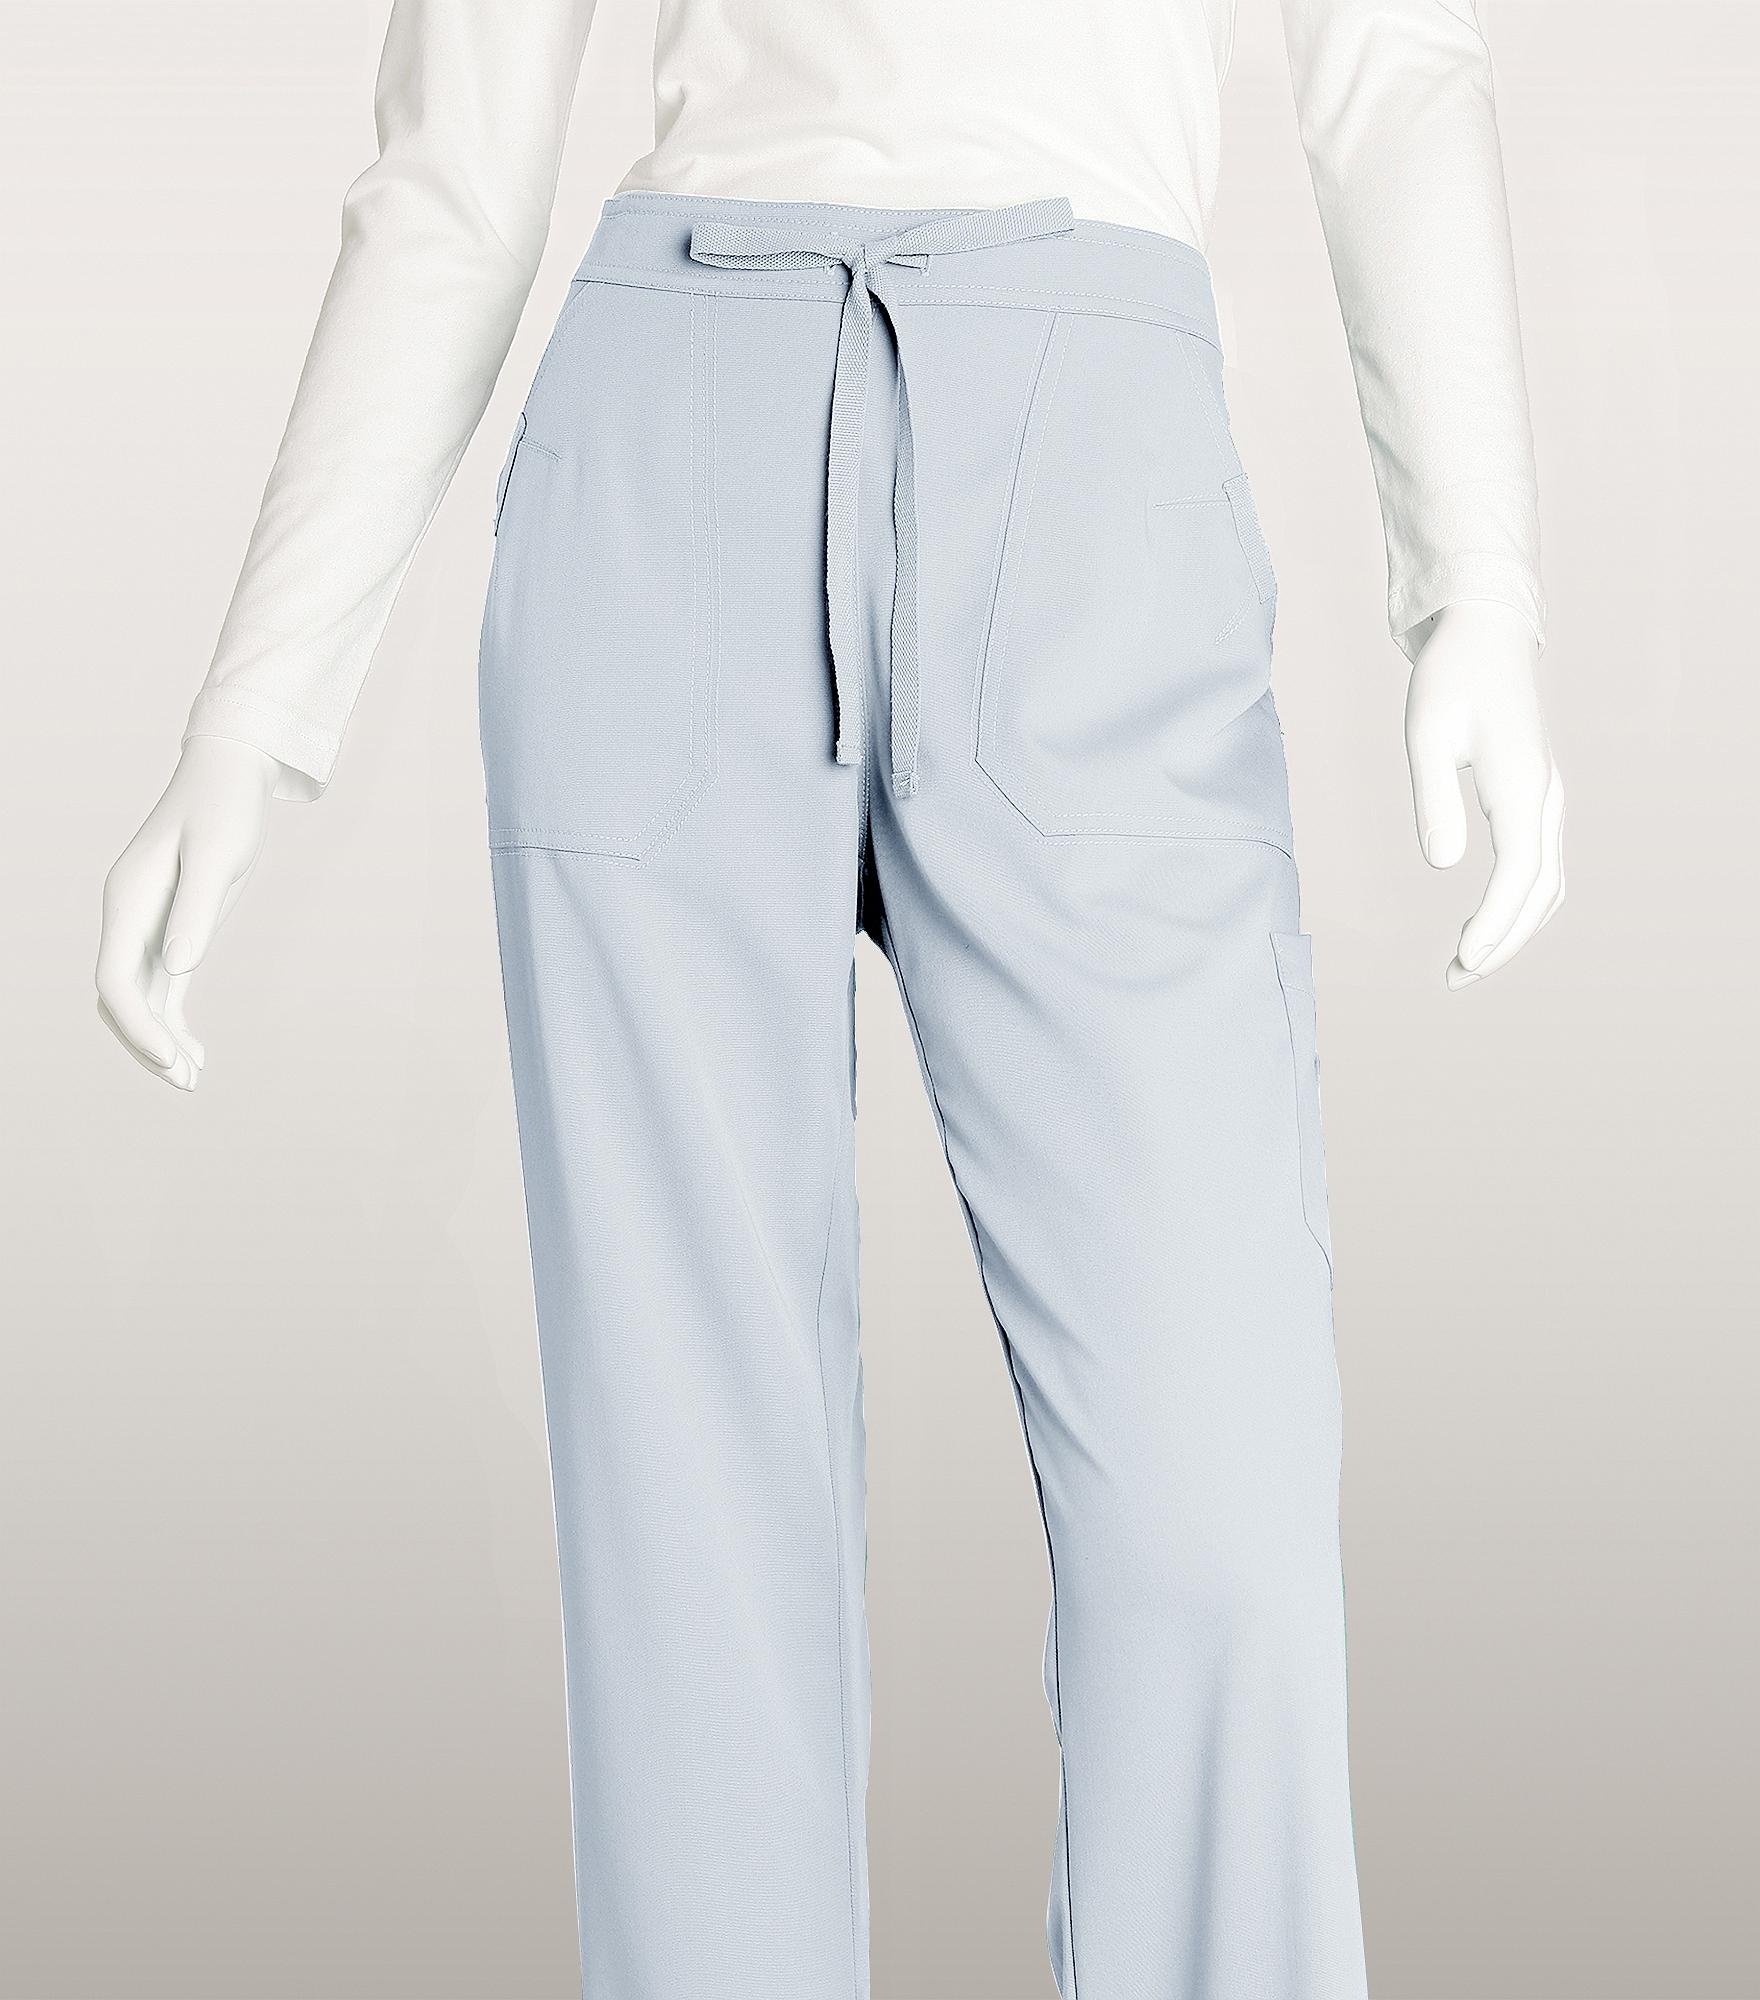 Grey/'s Anatomy Women/'s 4245 Drawstring Scrub Pant with Logo Elastic Back